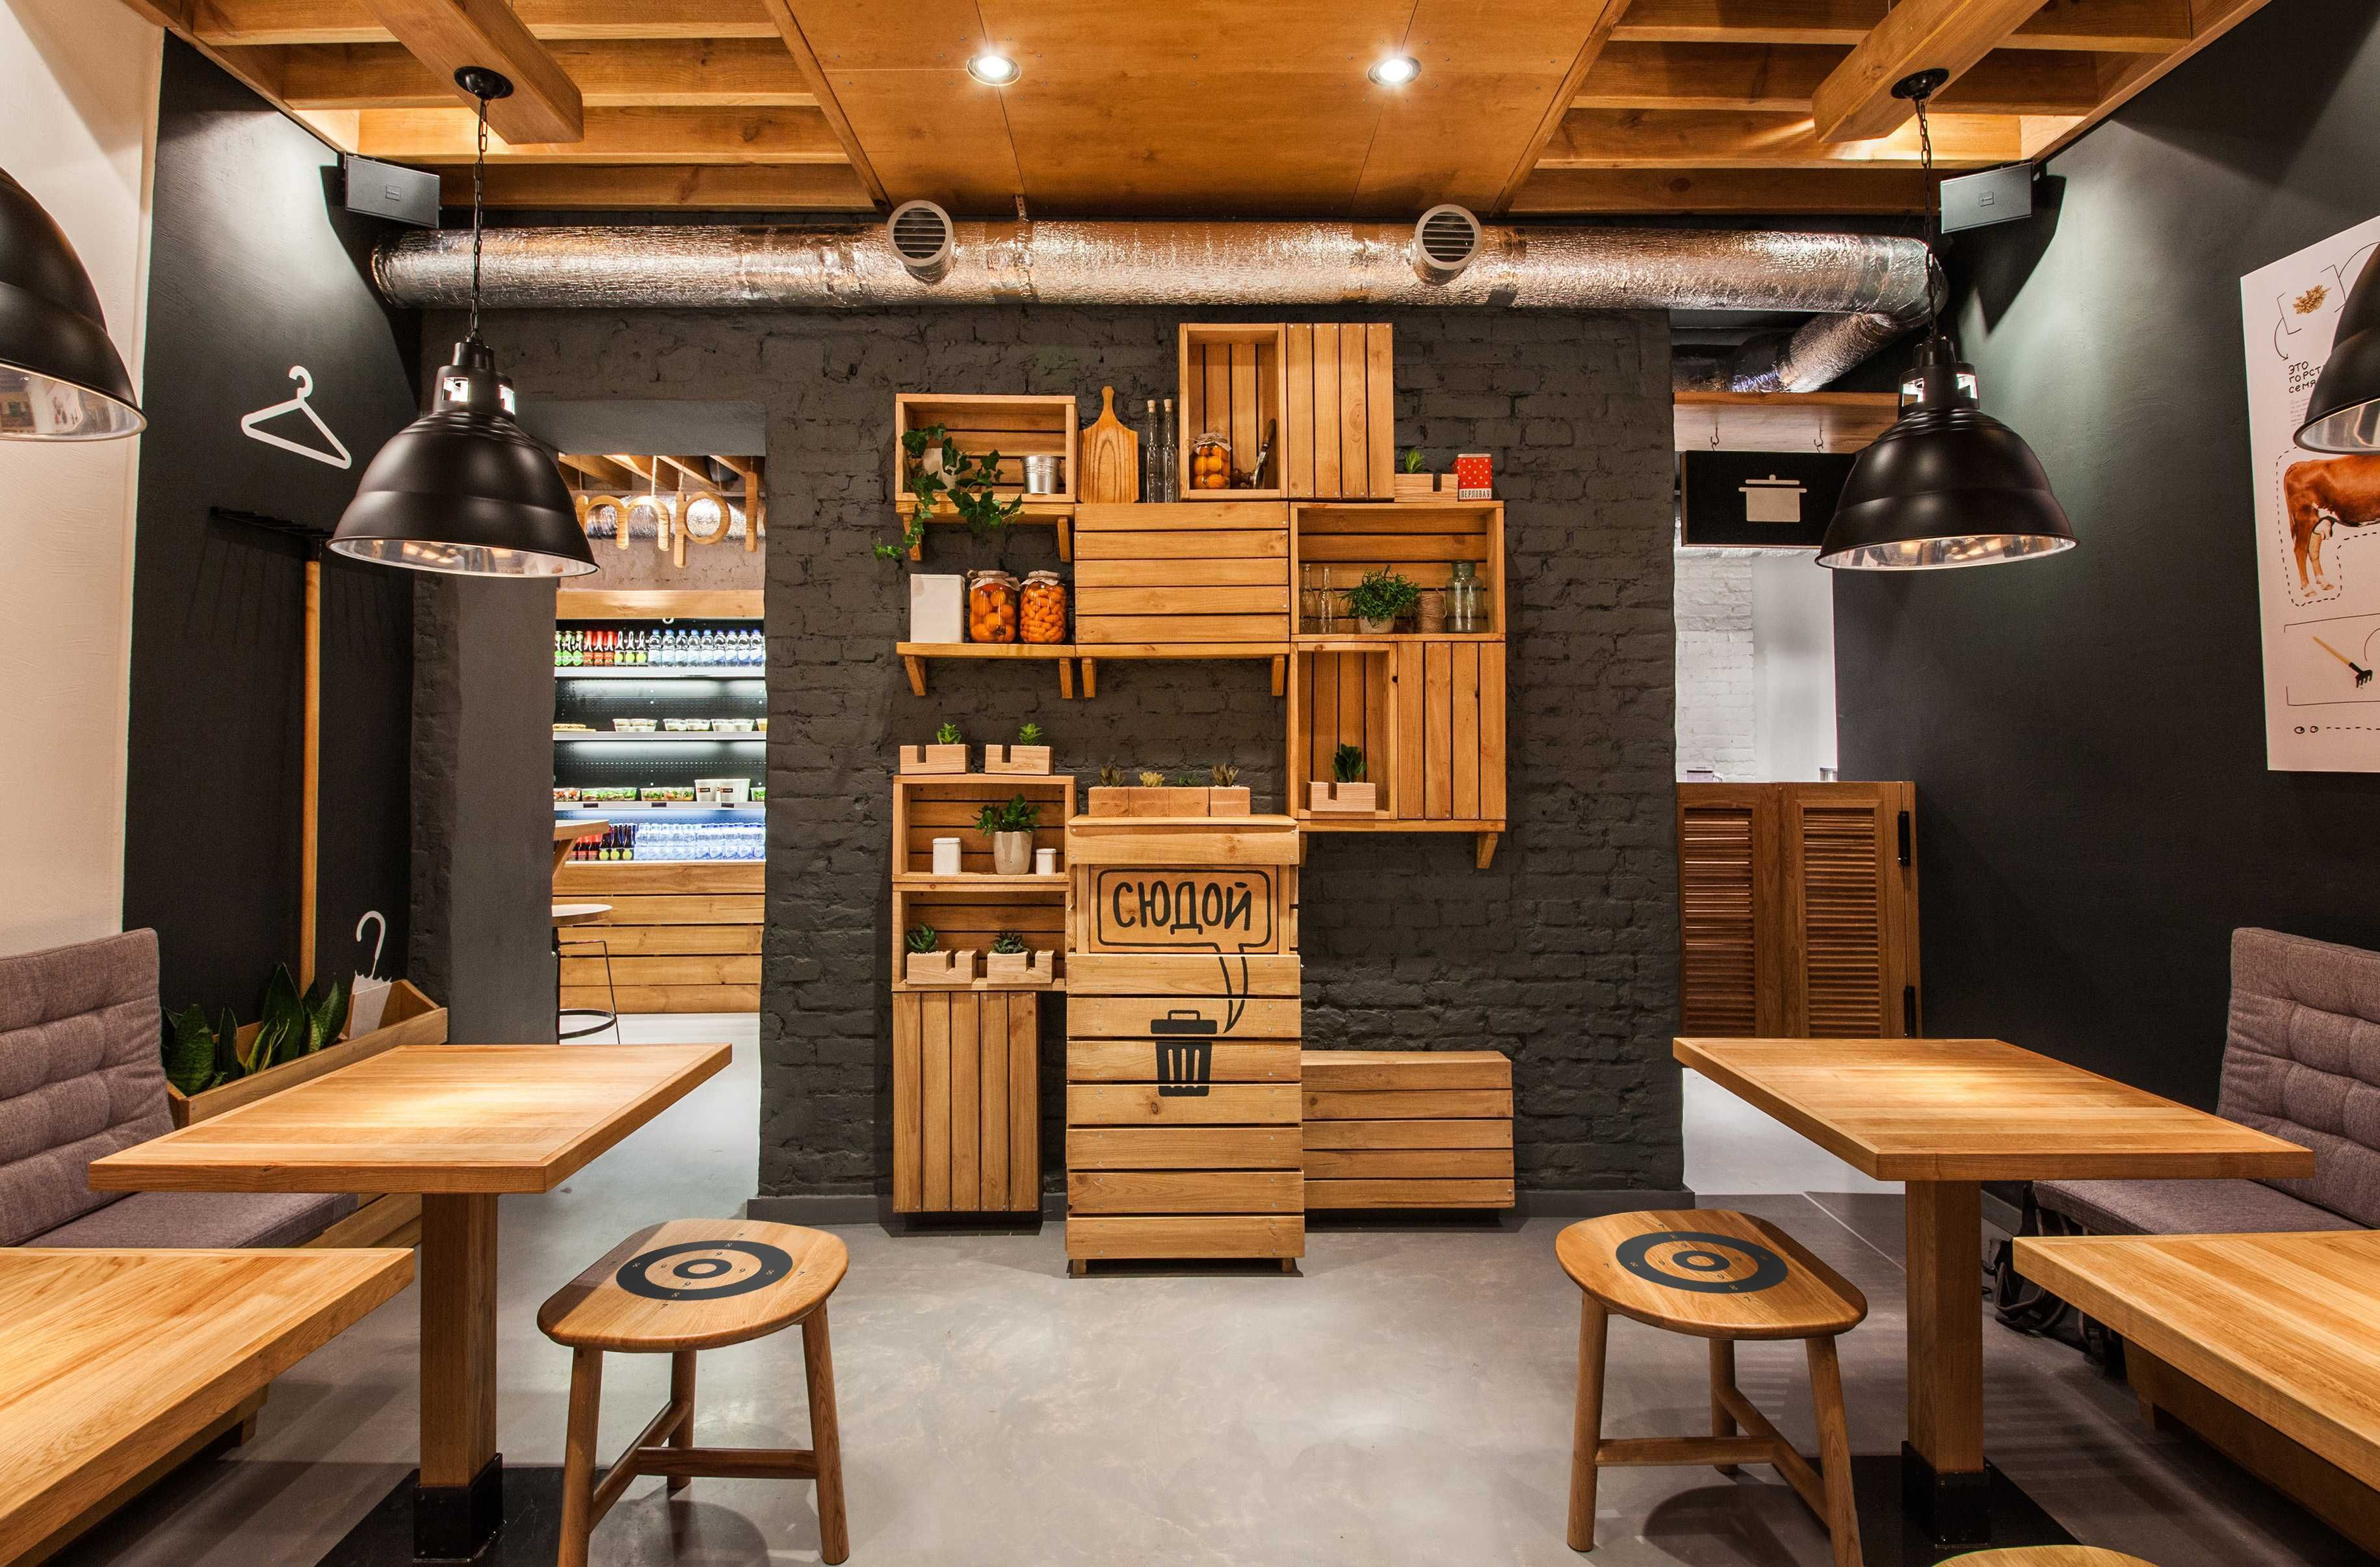 Fast Food Restaurant Design Ideas Restaurants In California Near Me 2018 Including Incredib Cafe Interior Design Restaurant Interior Design Restaurant Interior